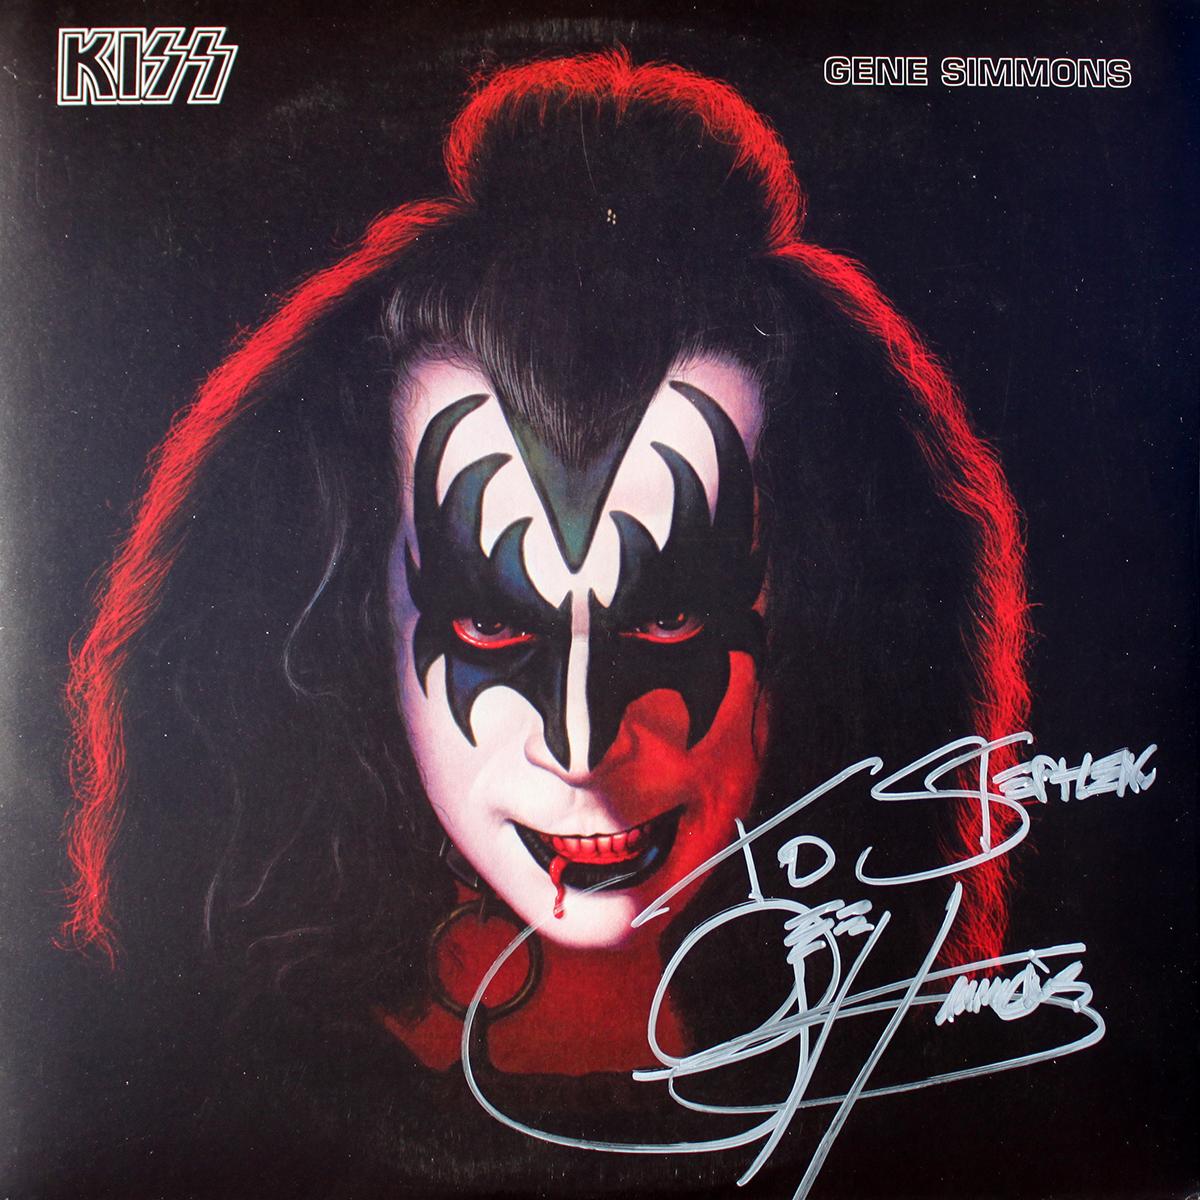 Gene Simmons - Solo Album #3